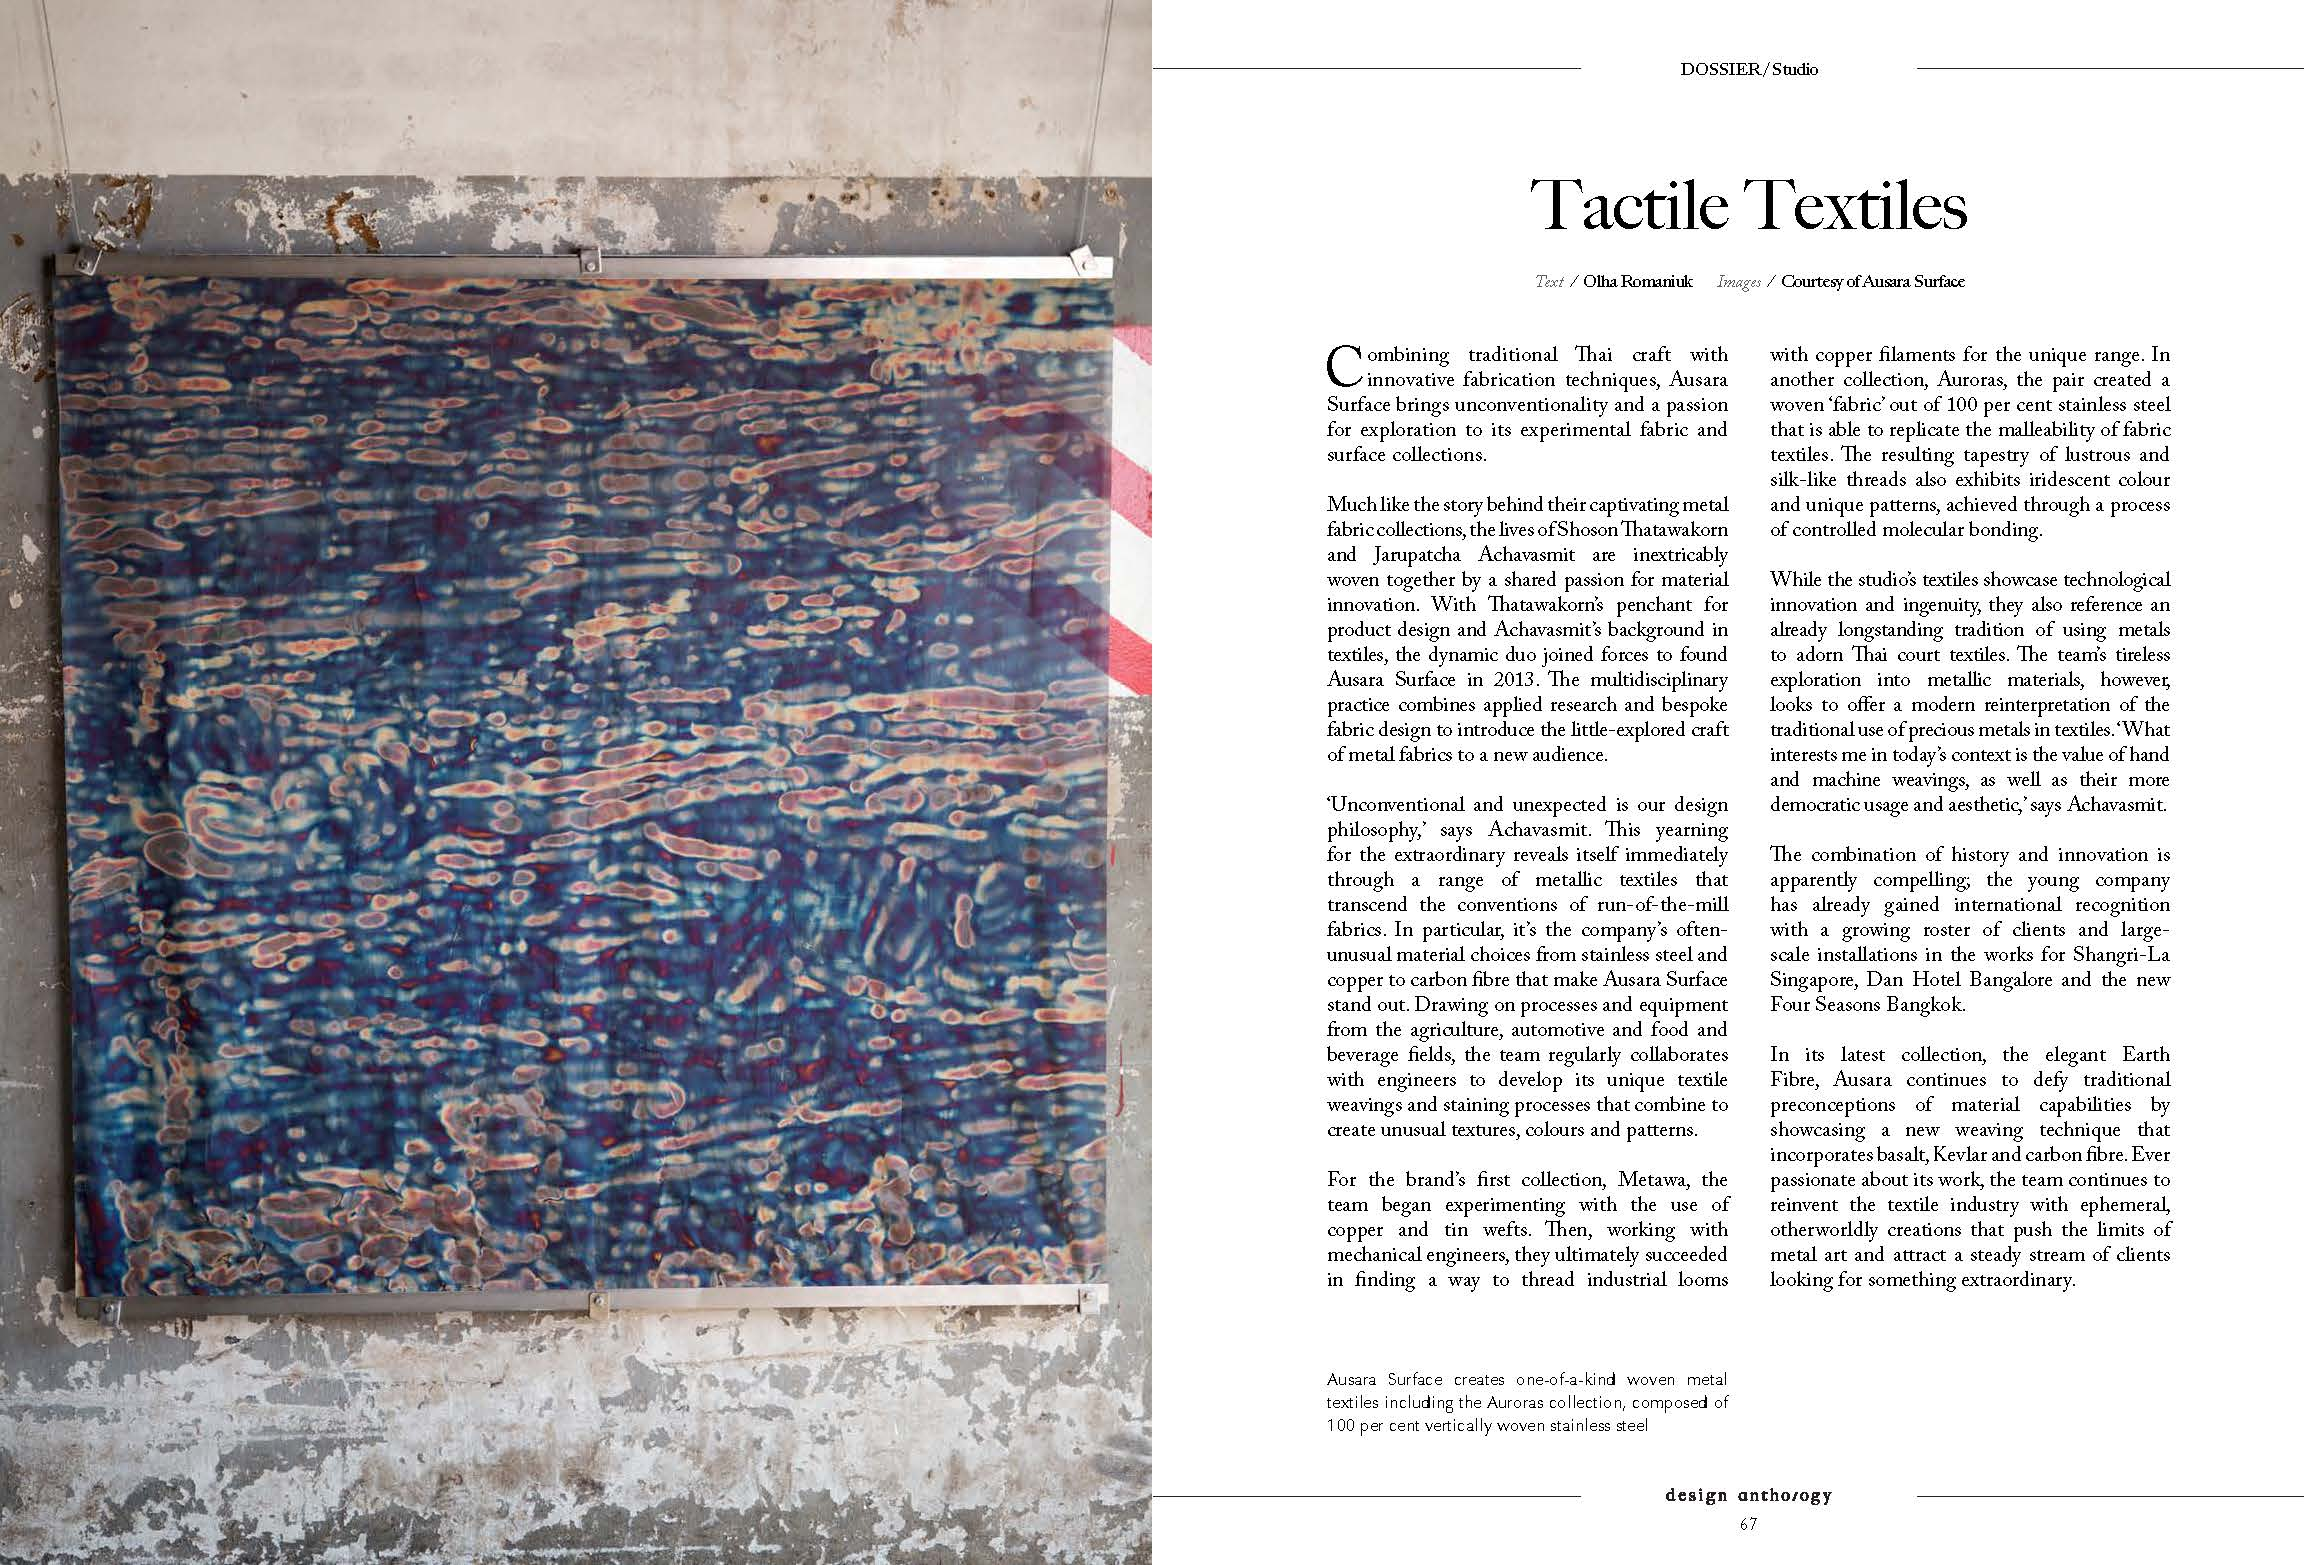 DA - Romaniuk - STUDIO Tactile Textiles_Page_1.jpg